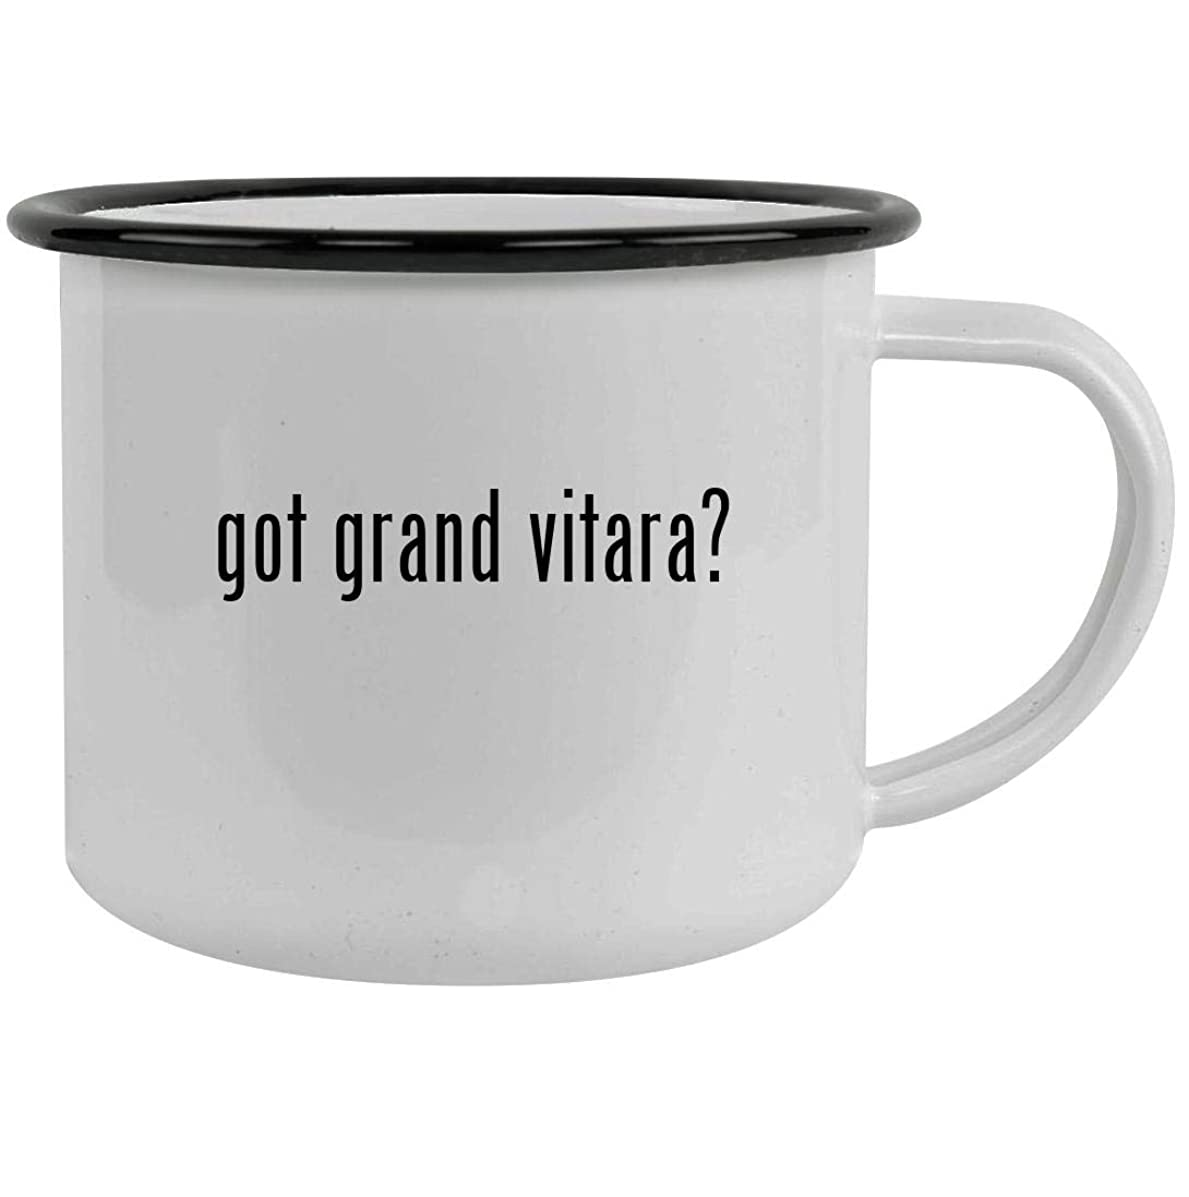 got grand vitara? - 12oz Stainless Steel Camping Mug, Black